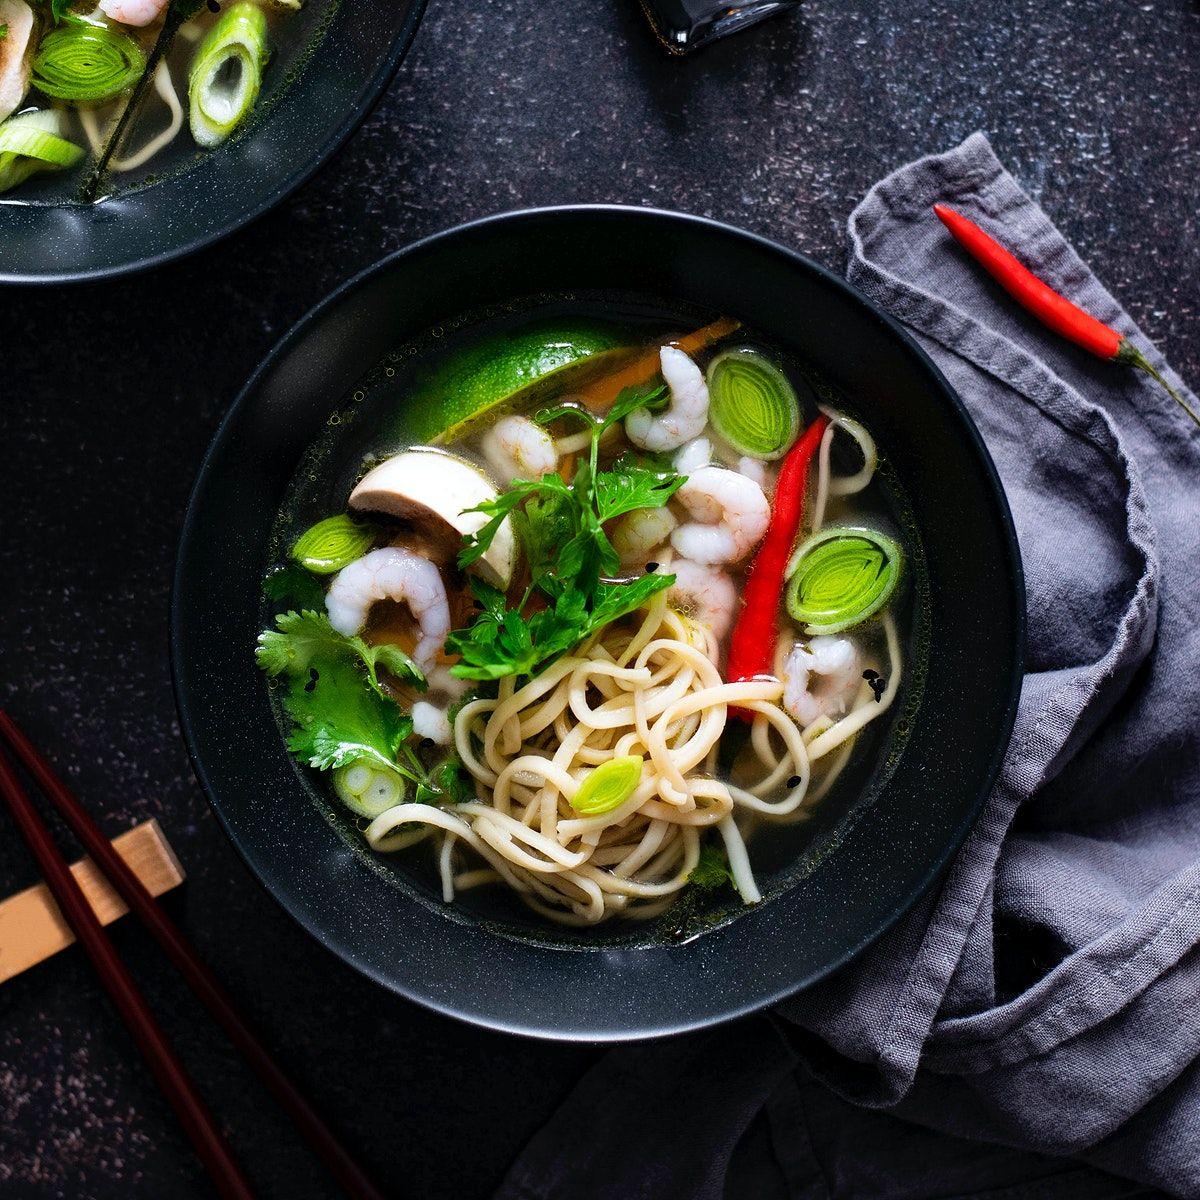 Best Asian Restaurants The True Taste Of Asia Asian Recipes Food Asian Cuisine